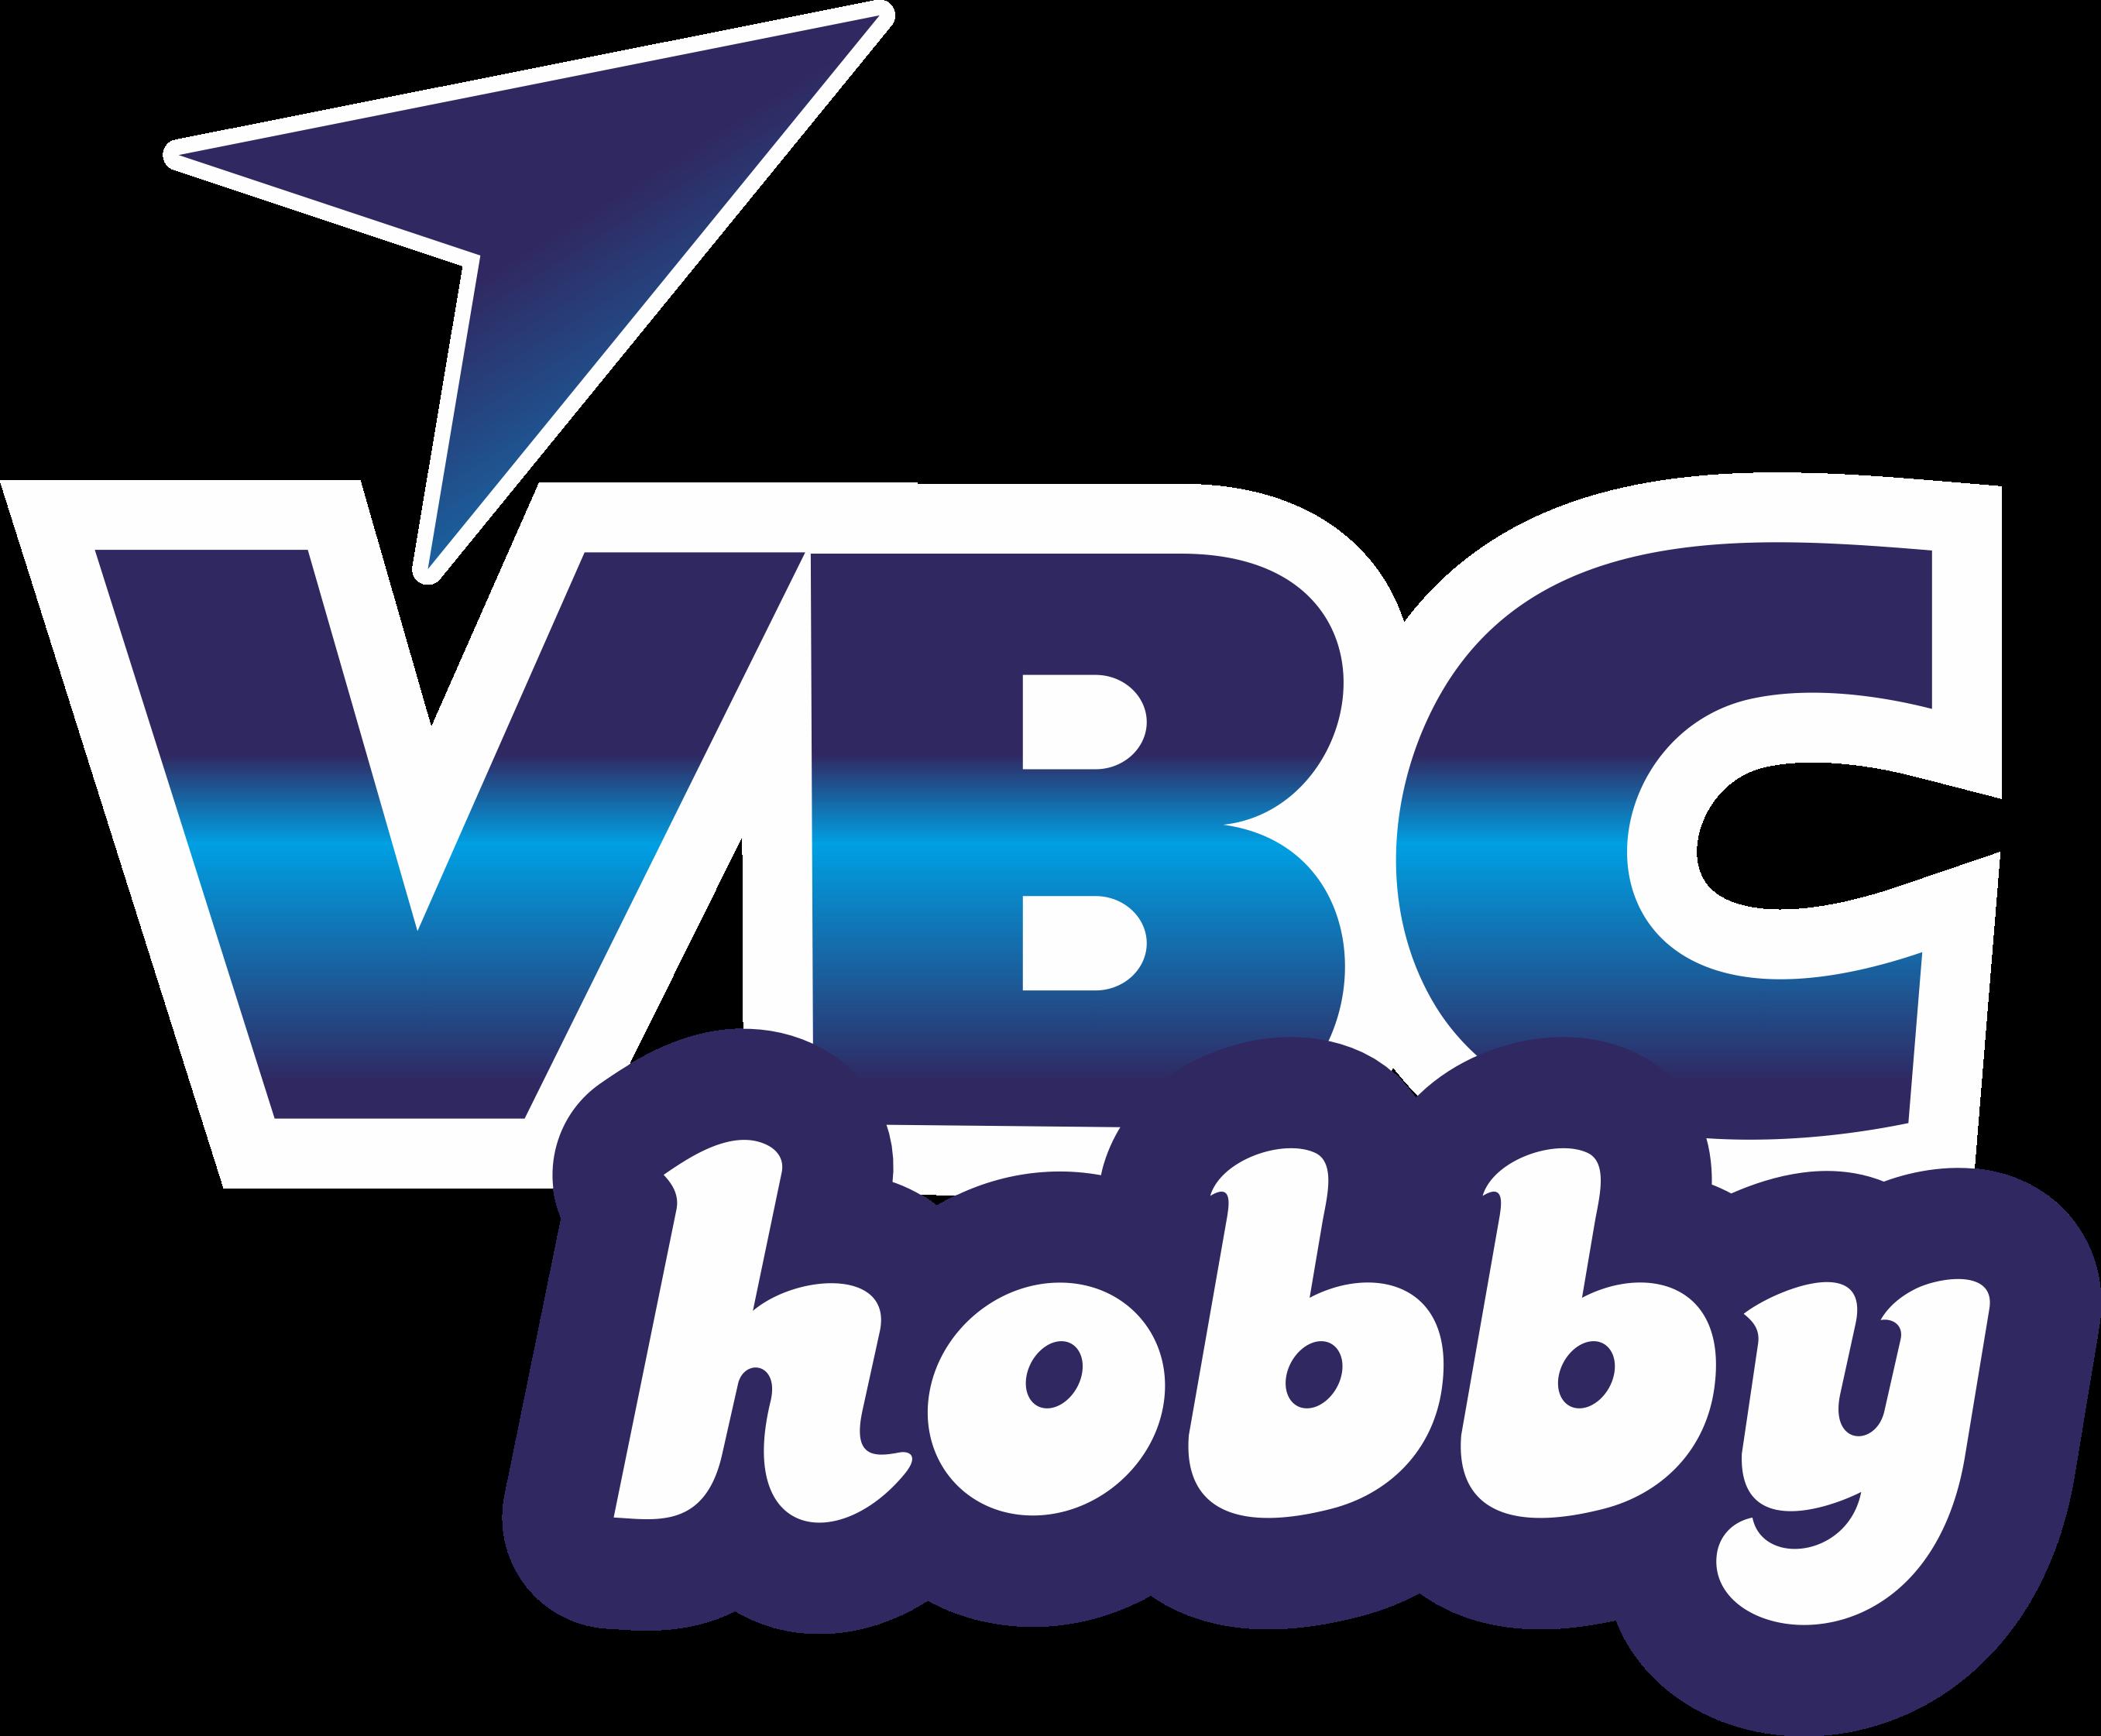 VBC HOBBY